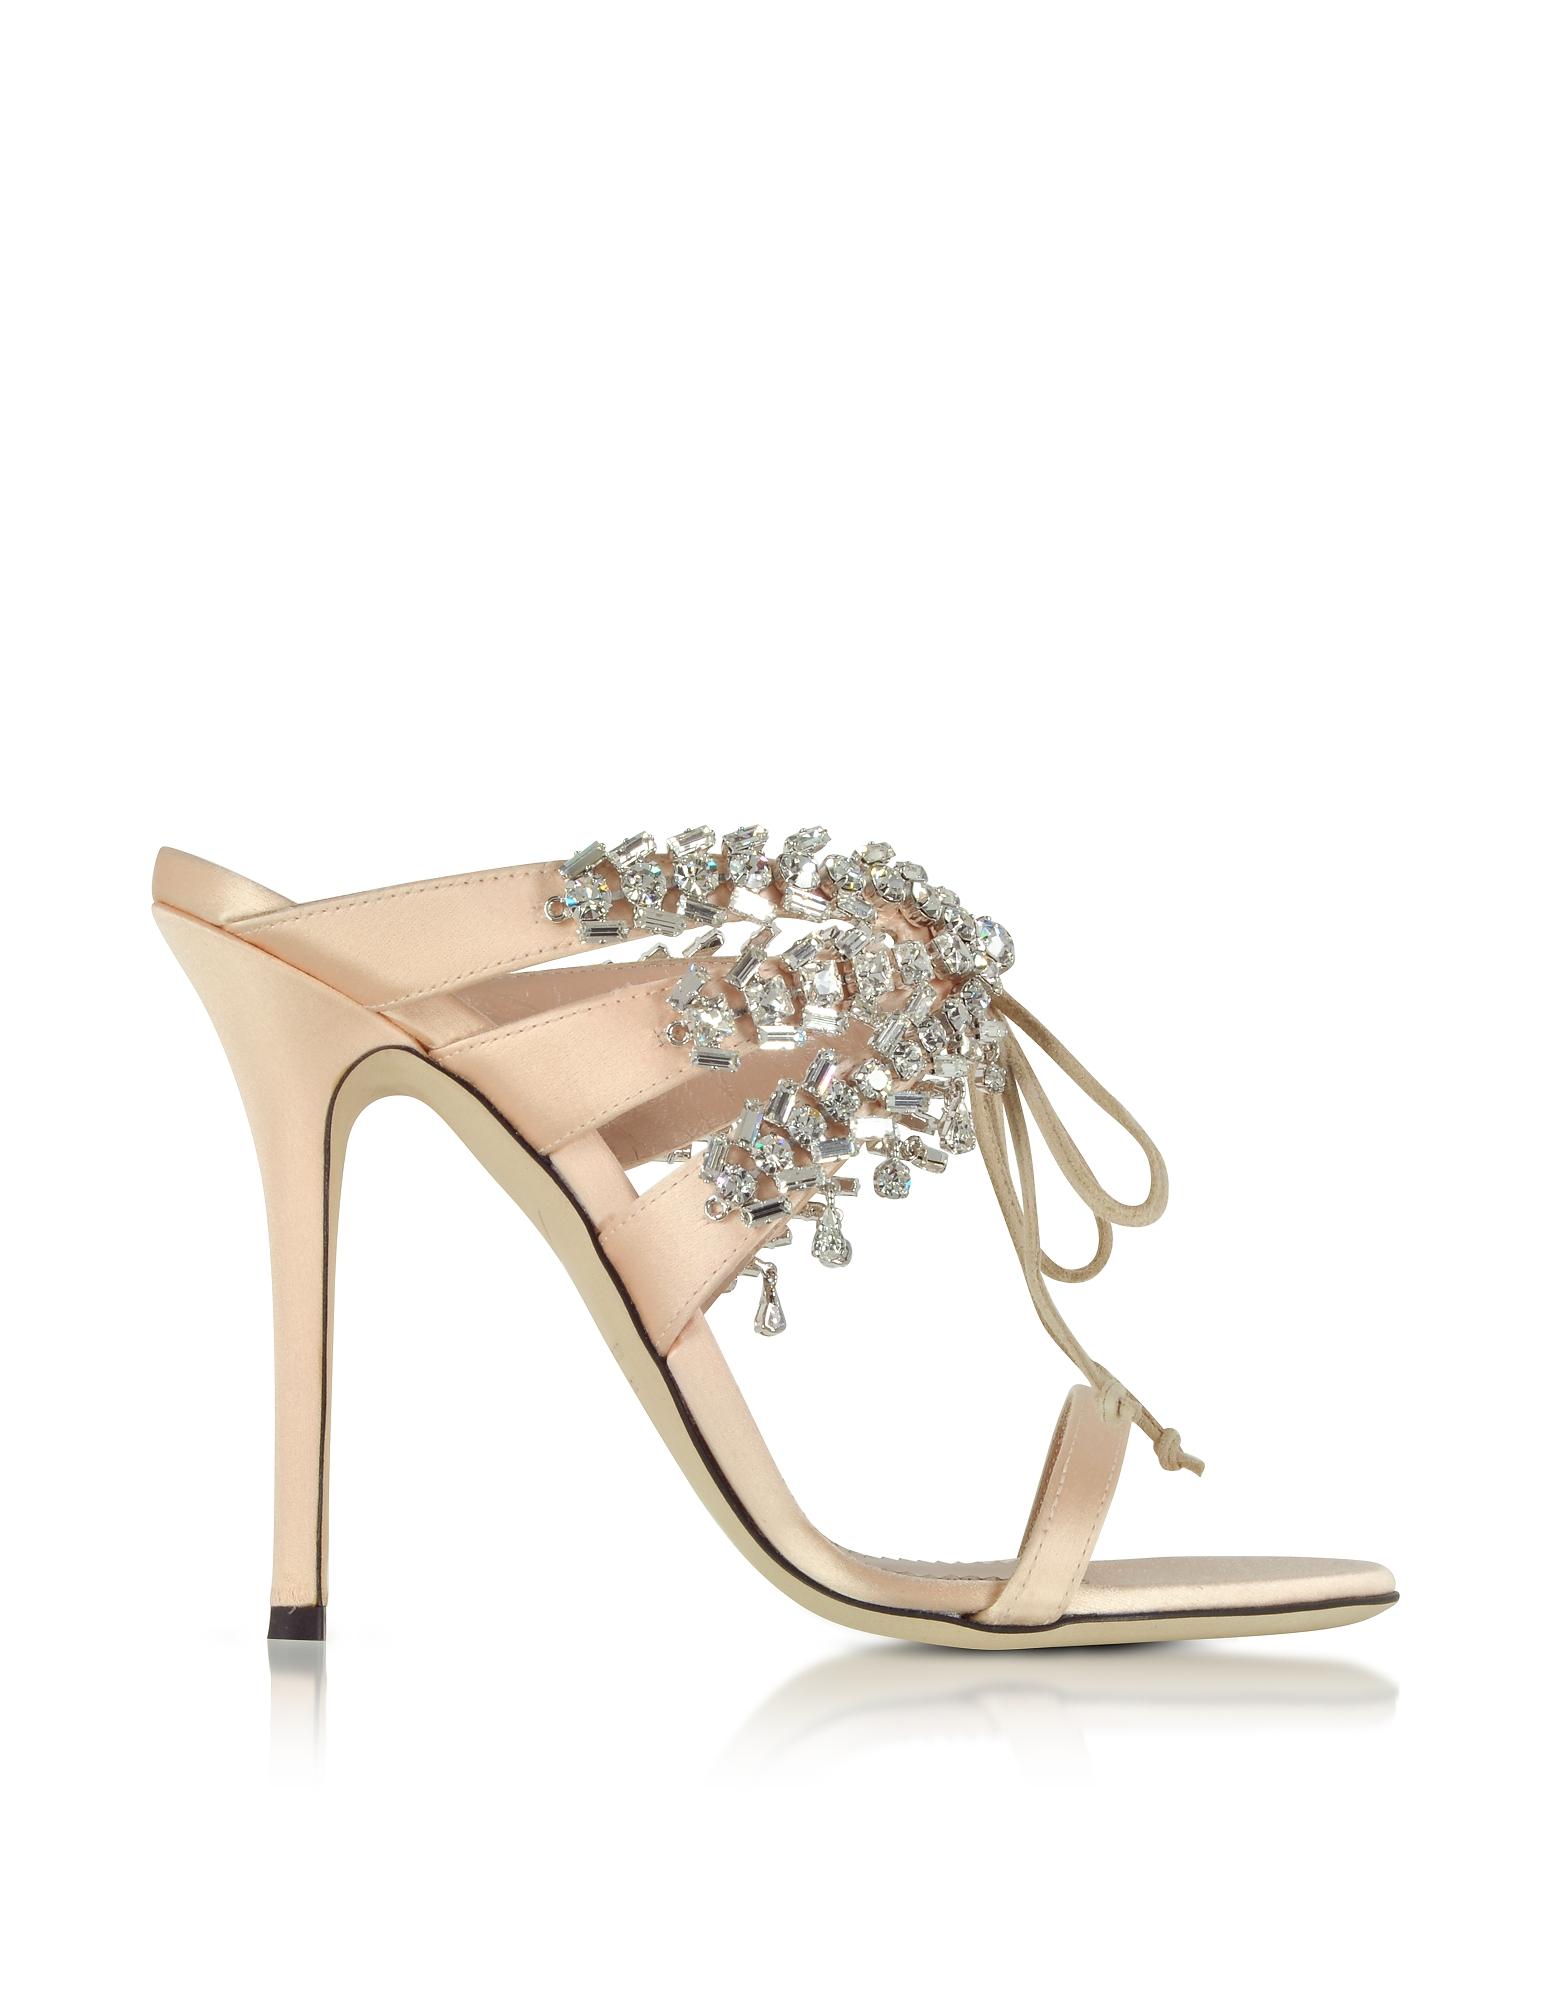 Nude Satin and Crystals High Heel Slide Sandals